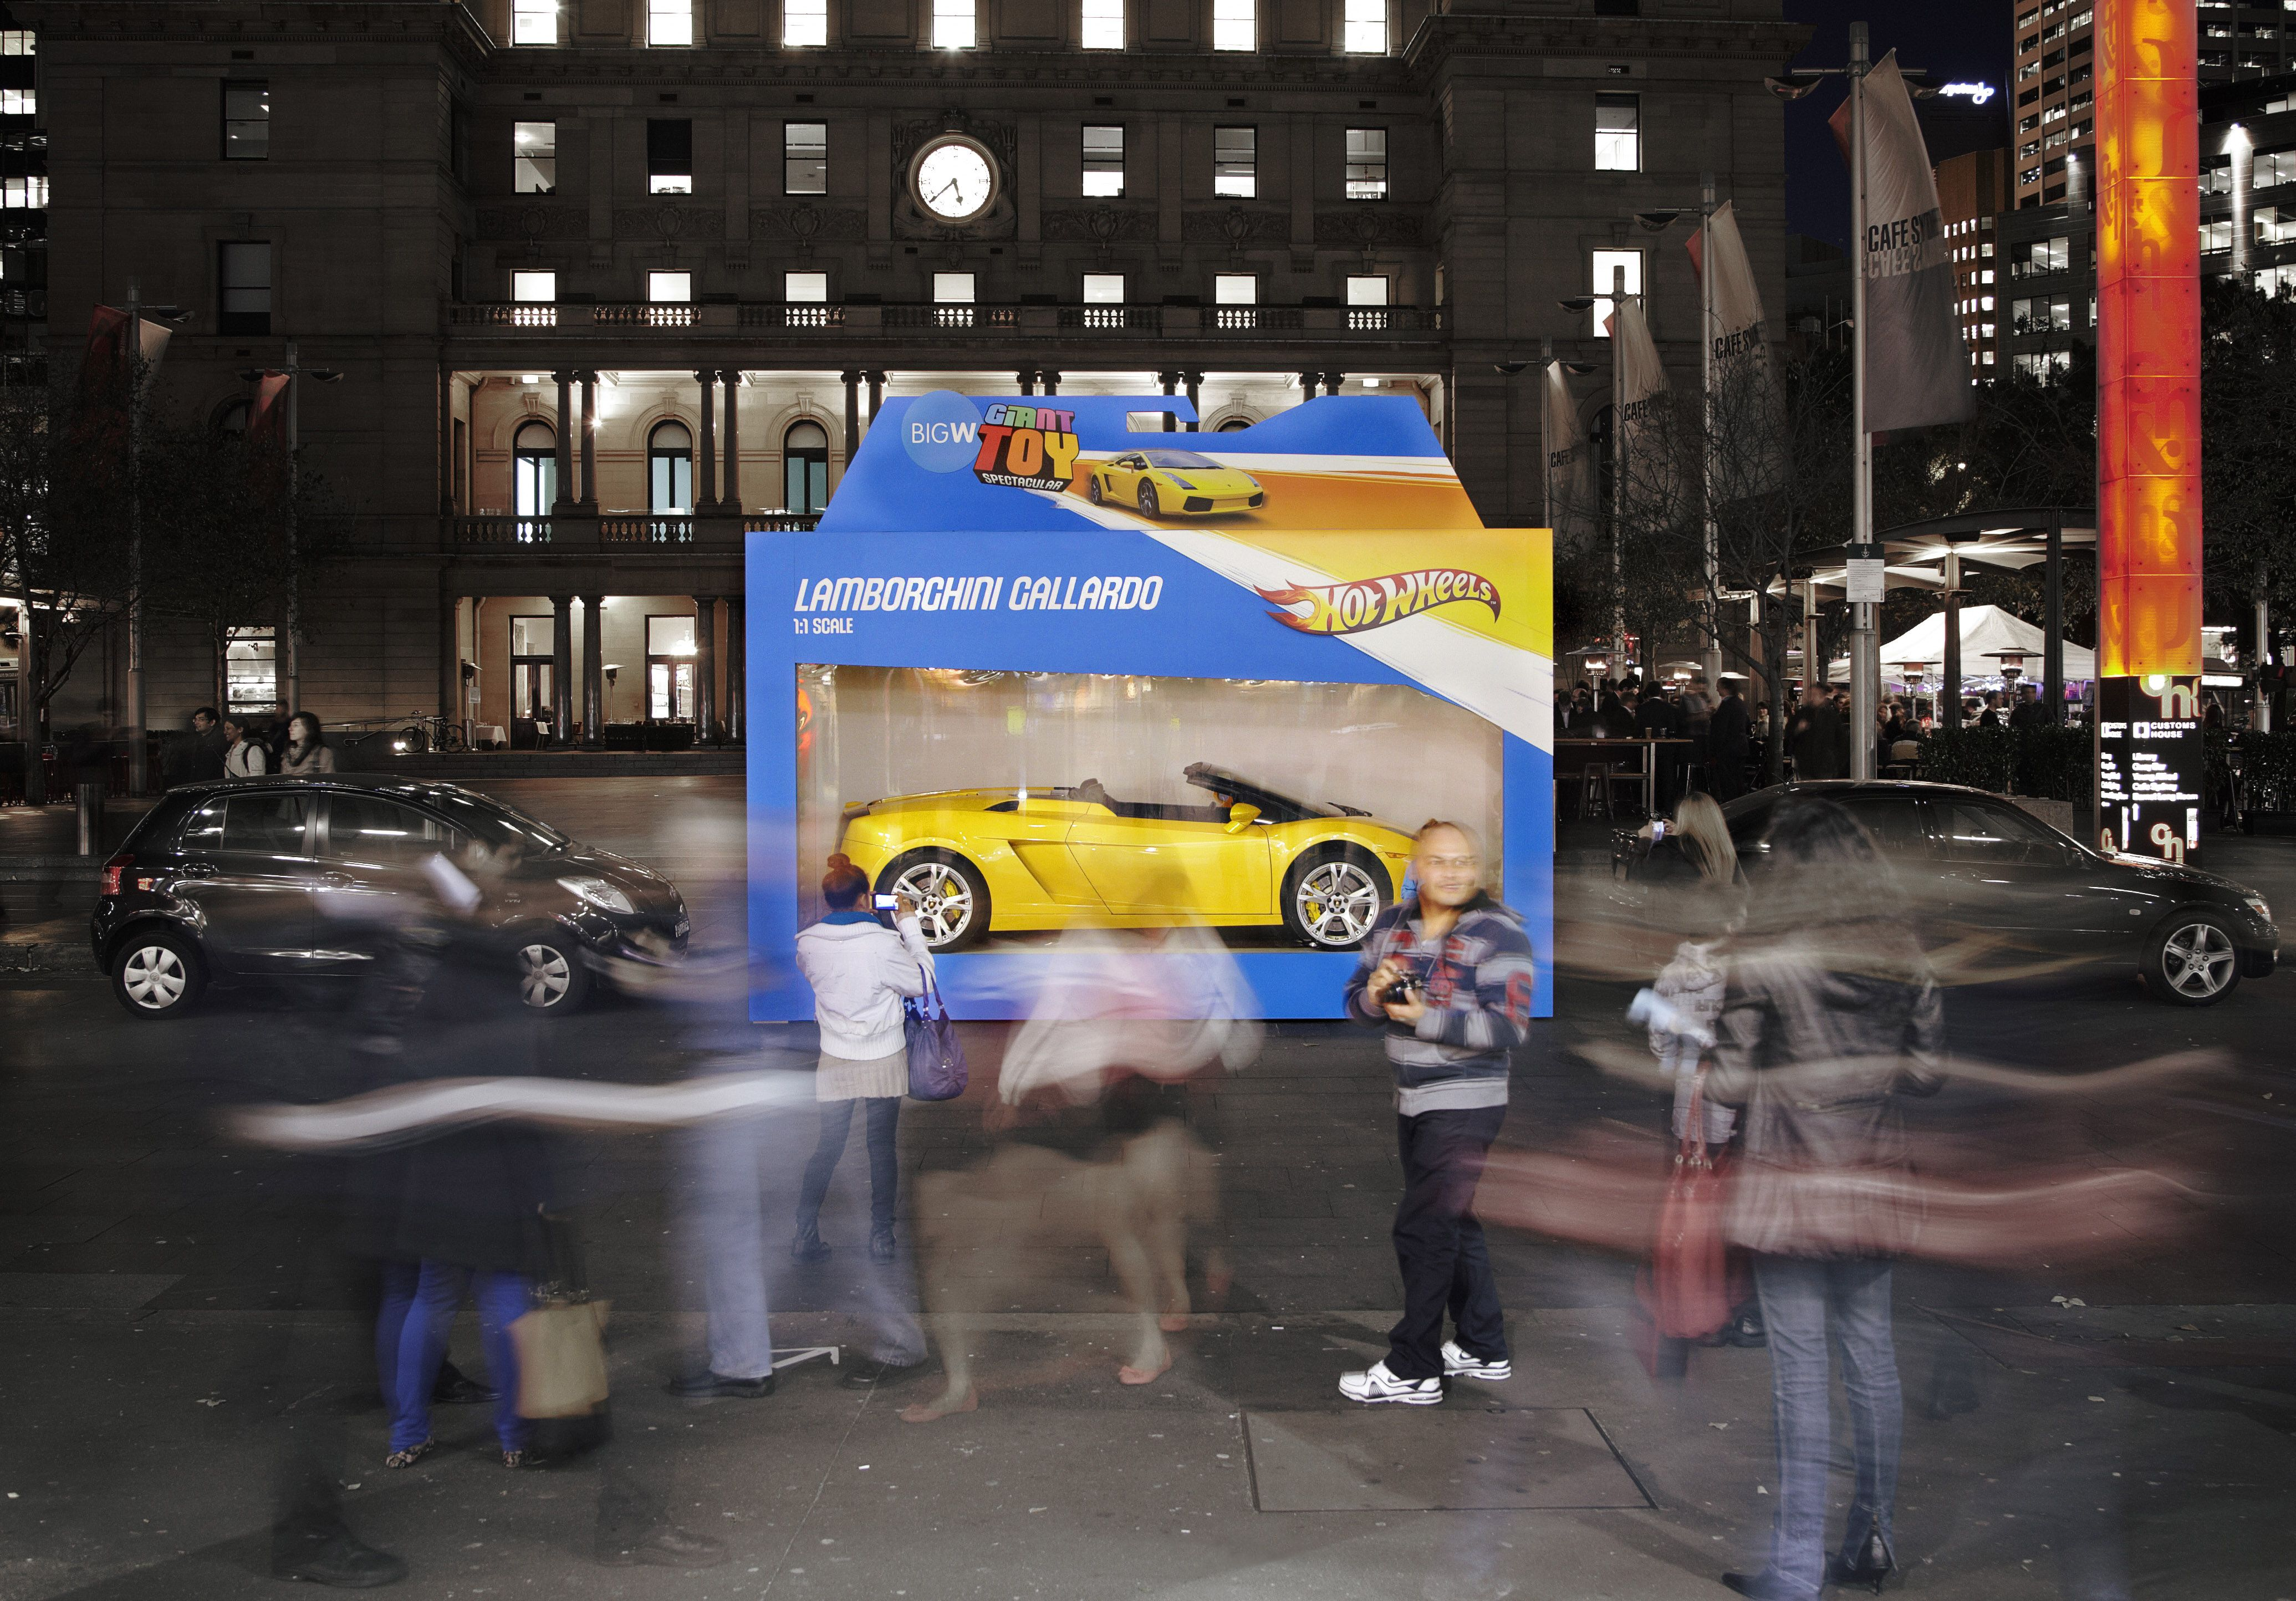 Bigw Box 078 R2 Jpg 4 142 2 888 Pixels Hot Wheels Cars